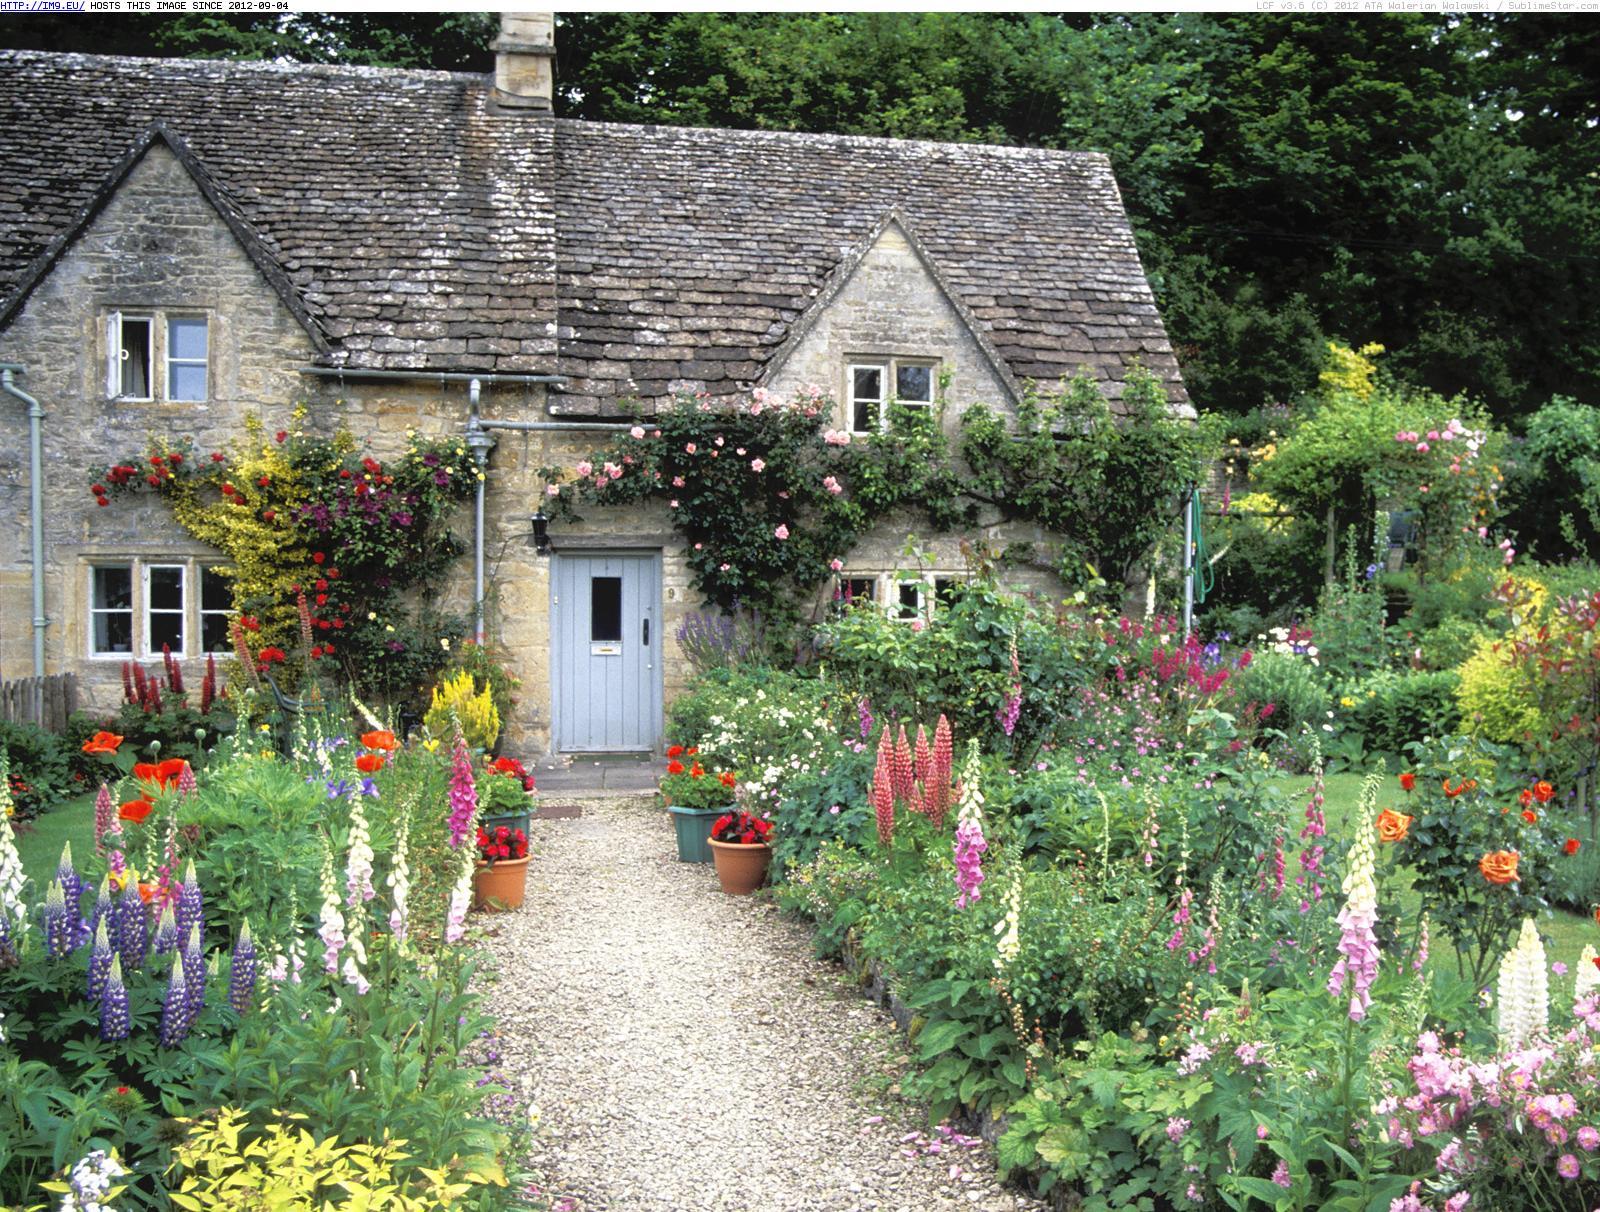 httppim9eucottage garden bilbury gloucestershire englandjpg 1600x1212